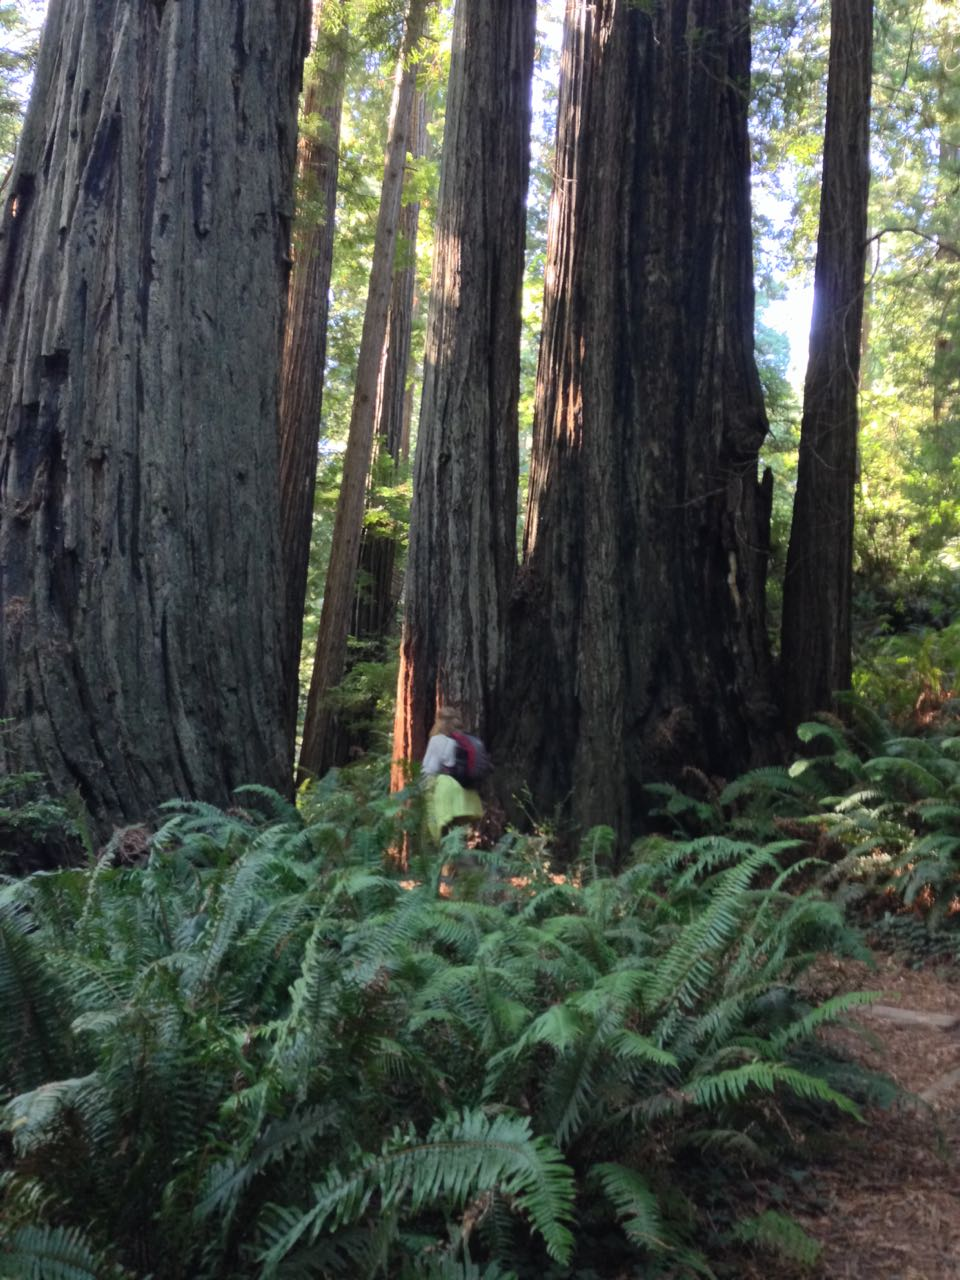 Redwoods 2017 10 01 221 Of 244